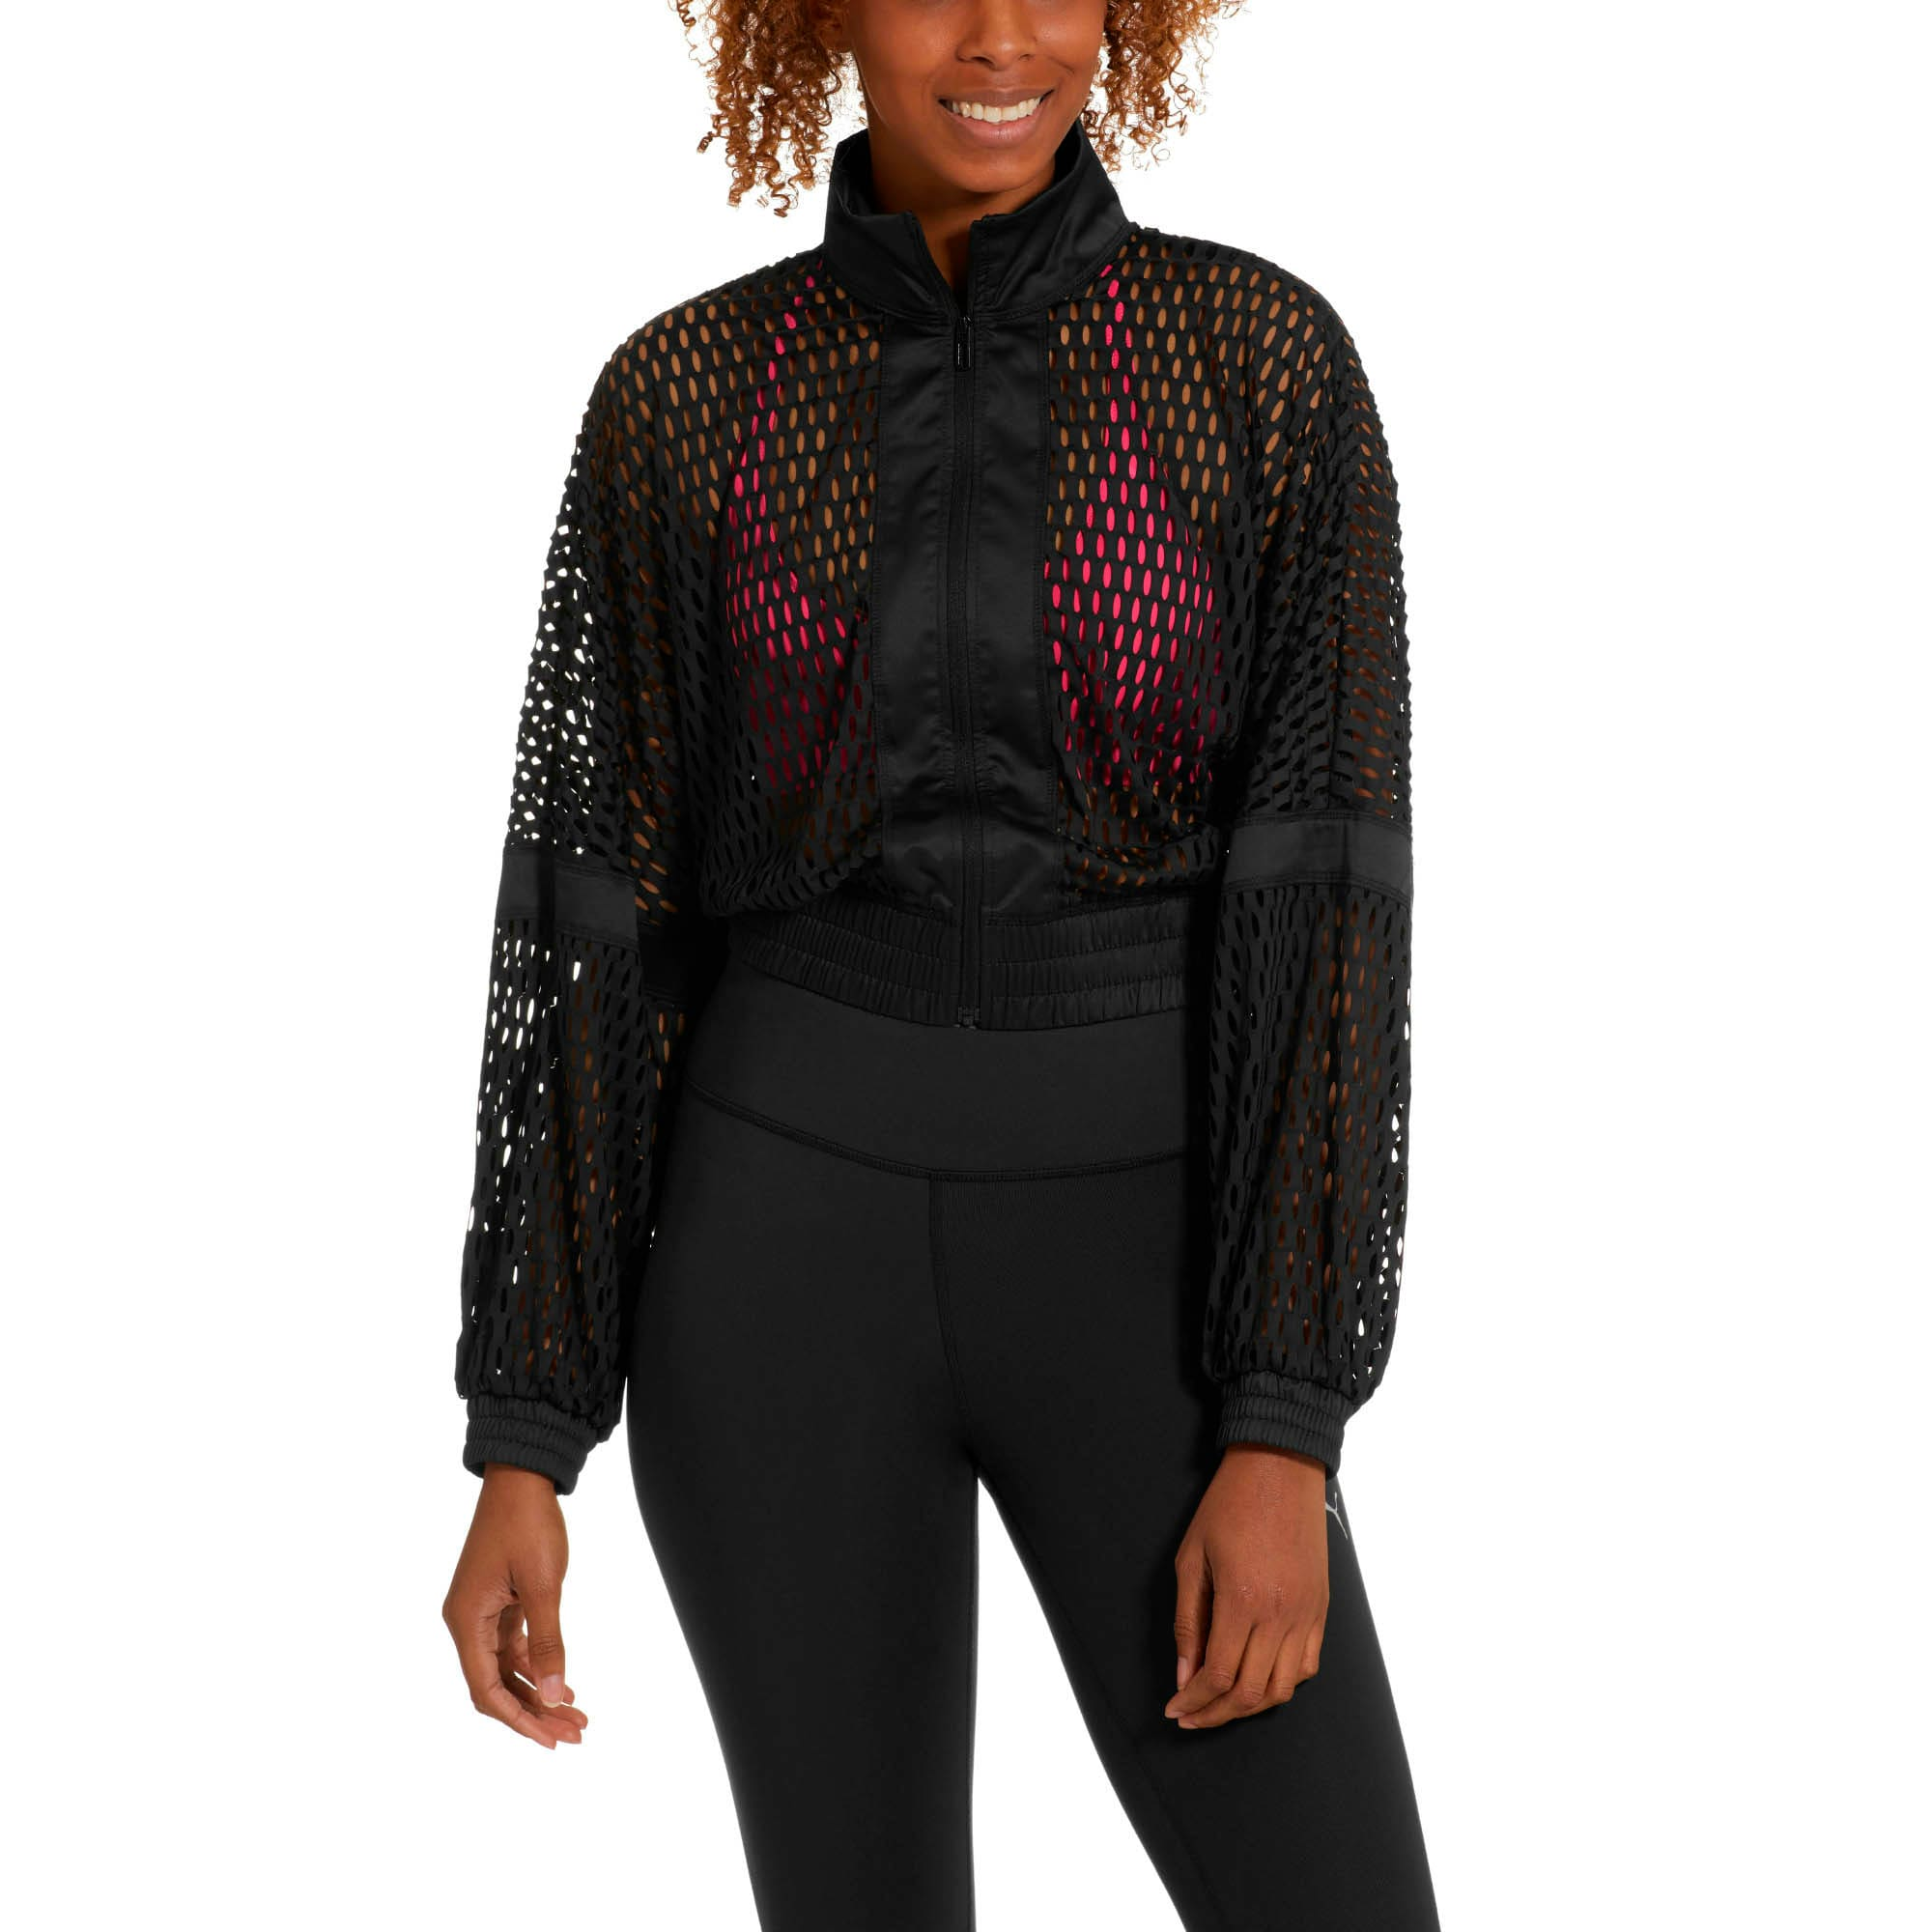 Thumbnail 1 of On the Brink Women's Knit Jacket, Puma Black, medium